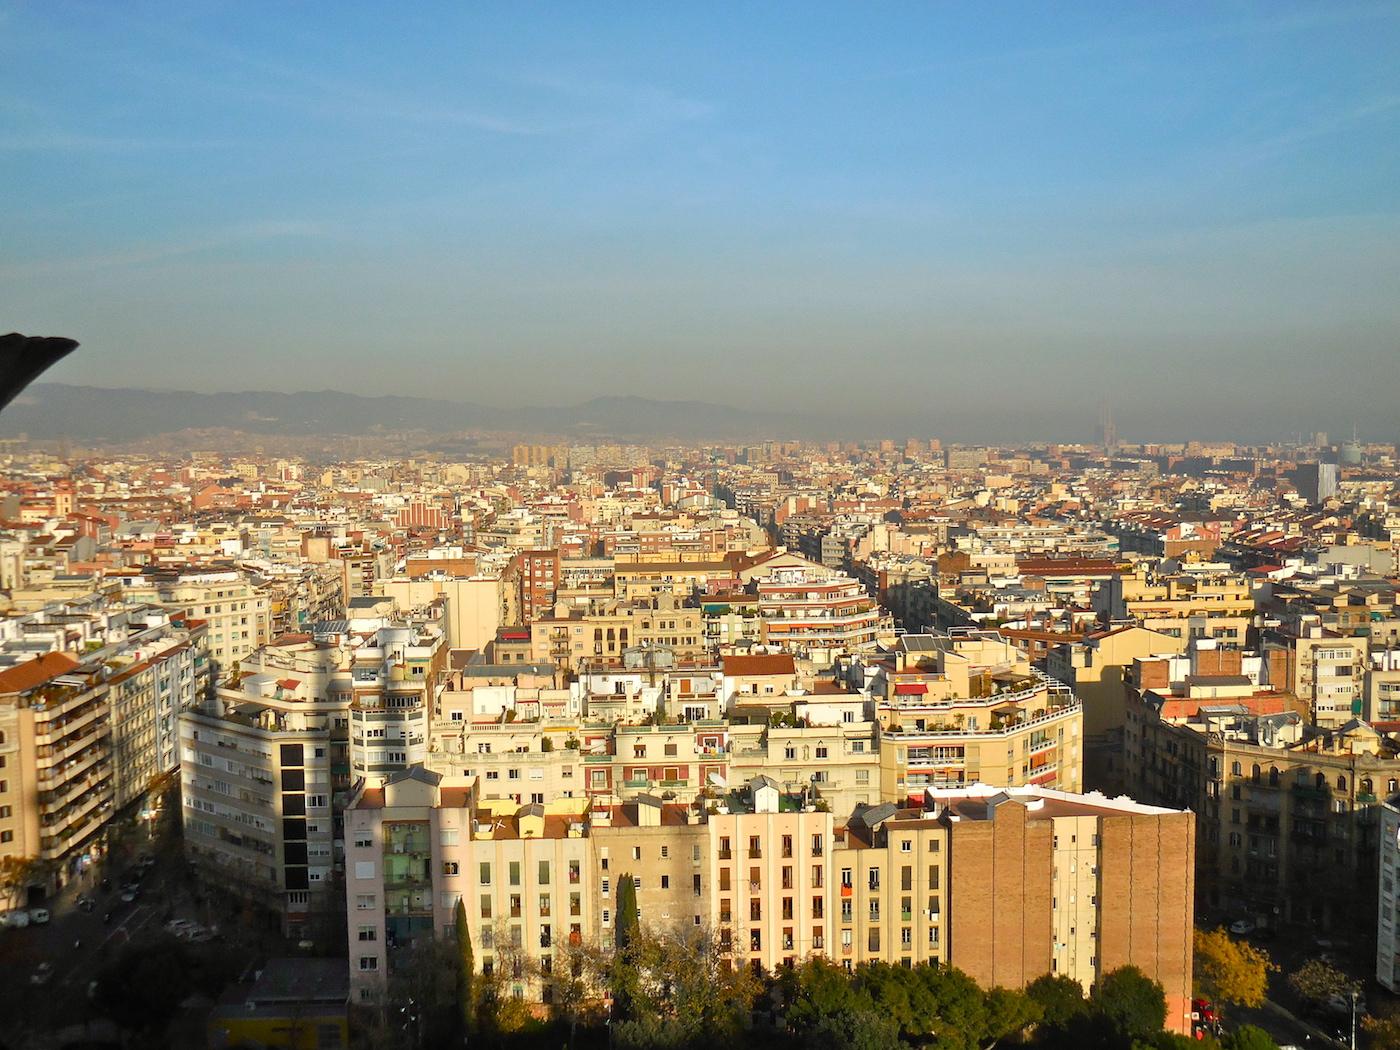 Touring Barcelona's Sagrada Familia | SkyriseCities